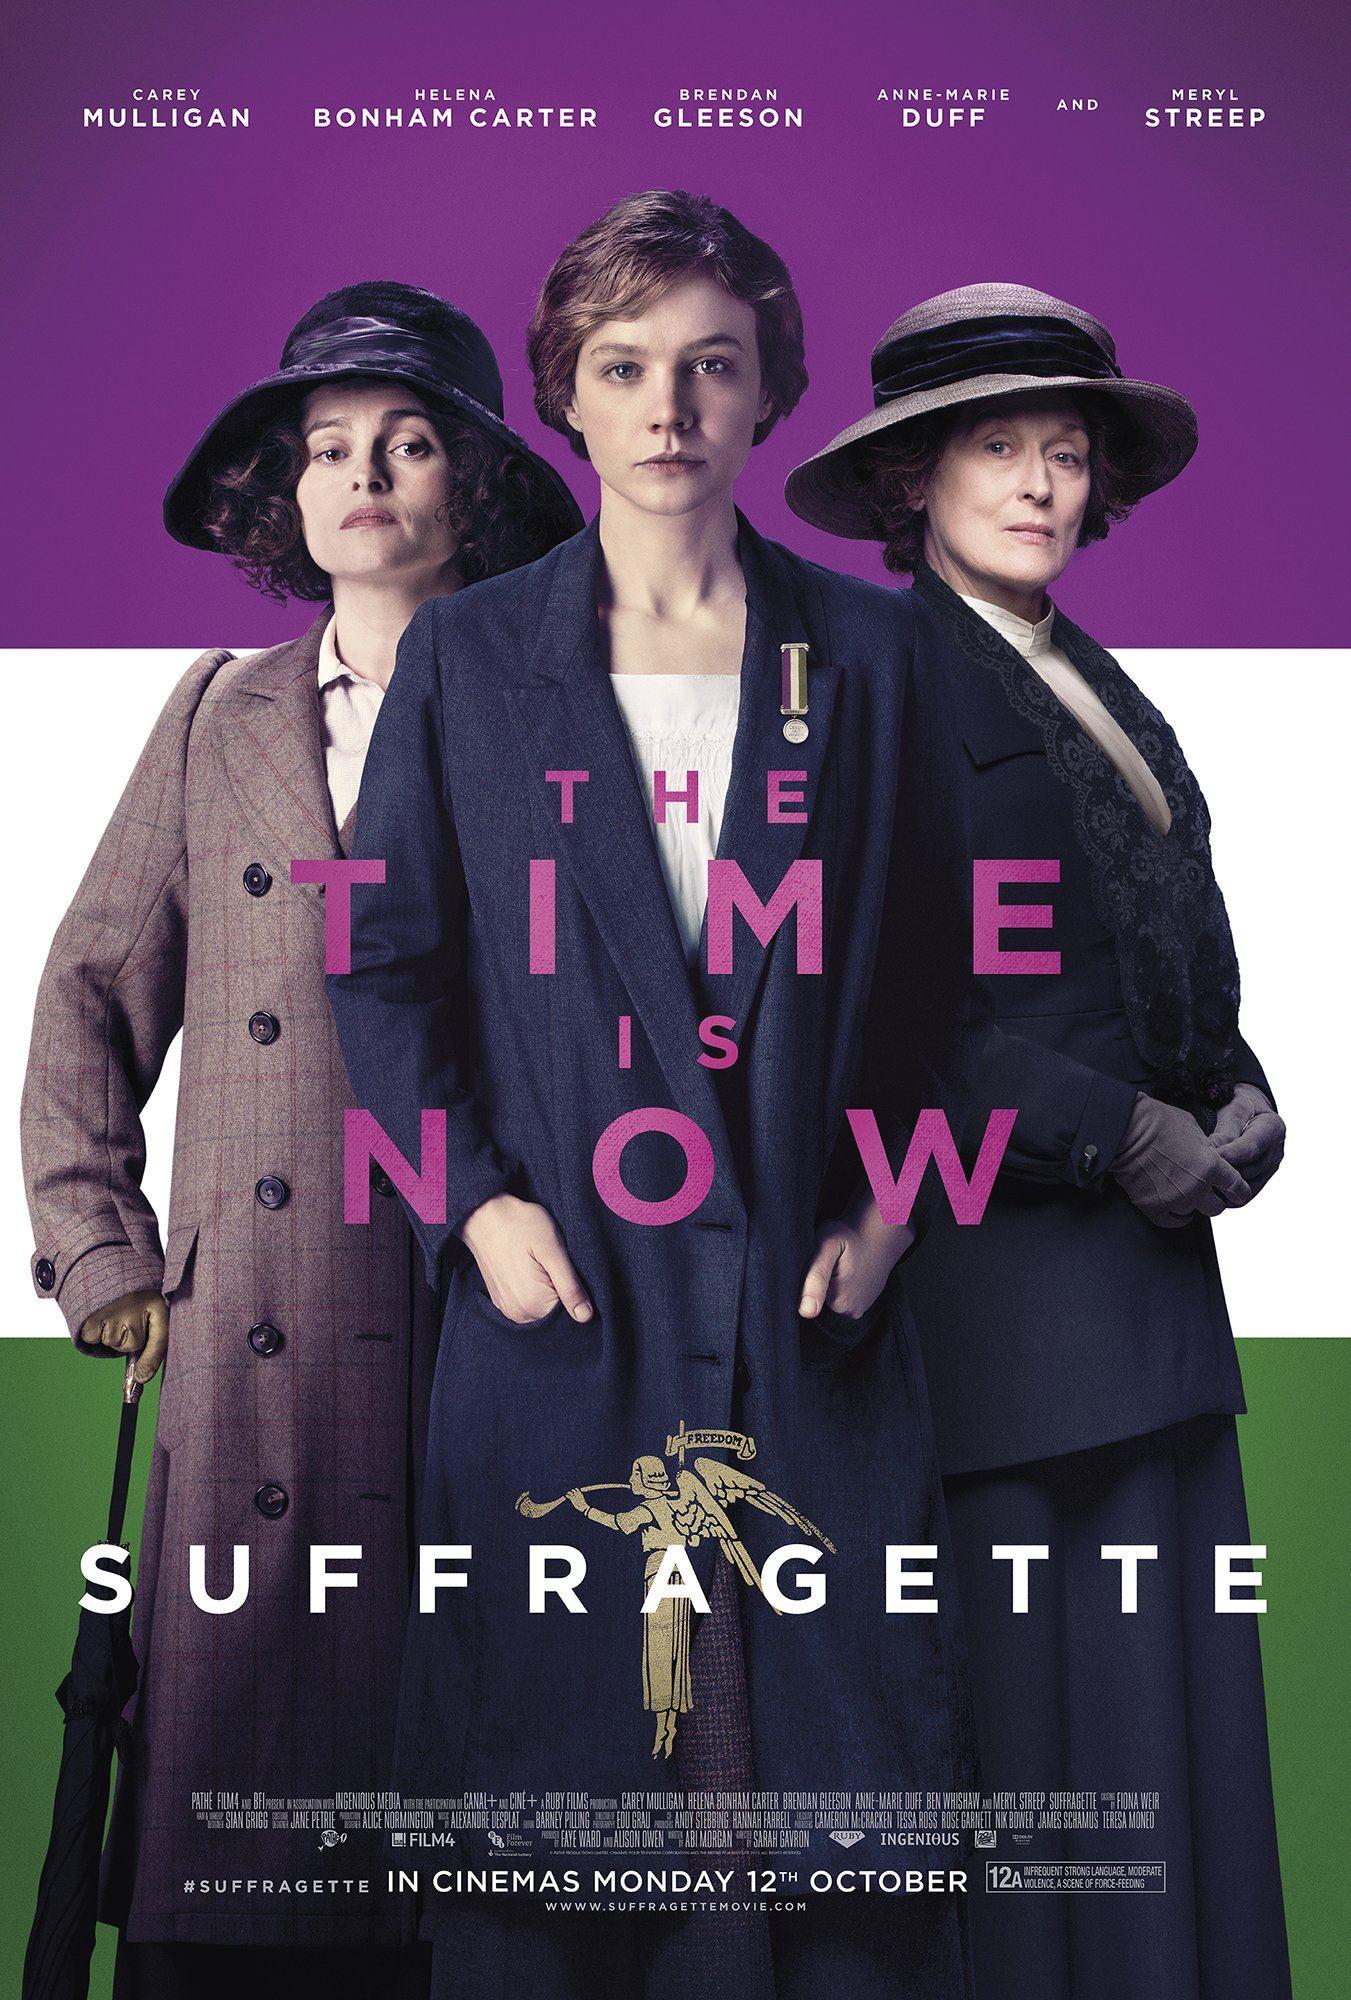 Suffragette, Röda kvarn Edsbyn